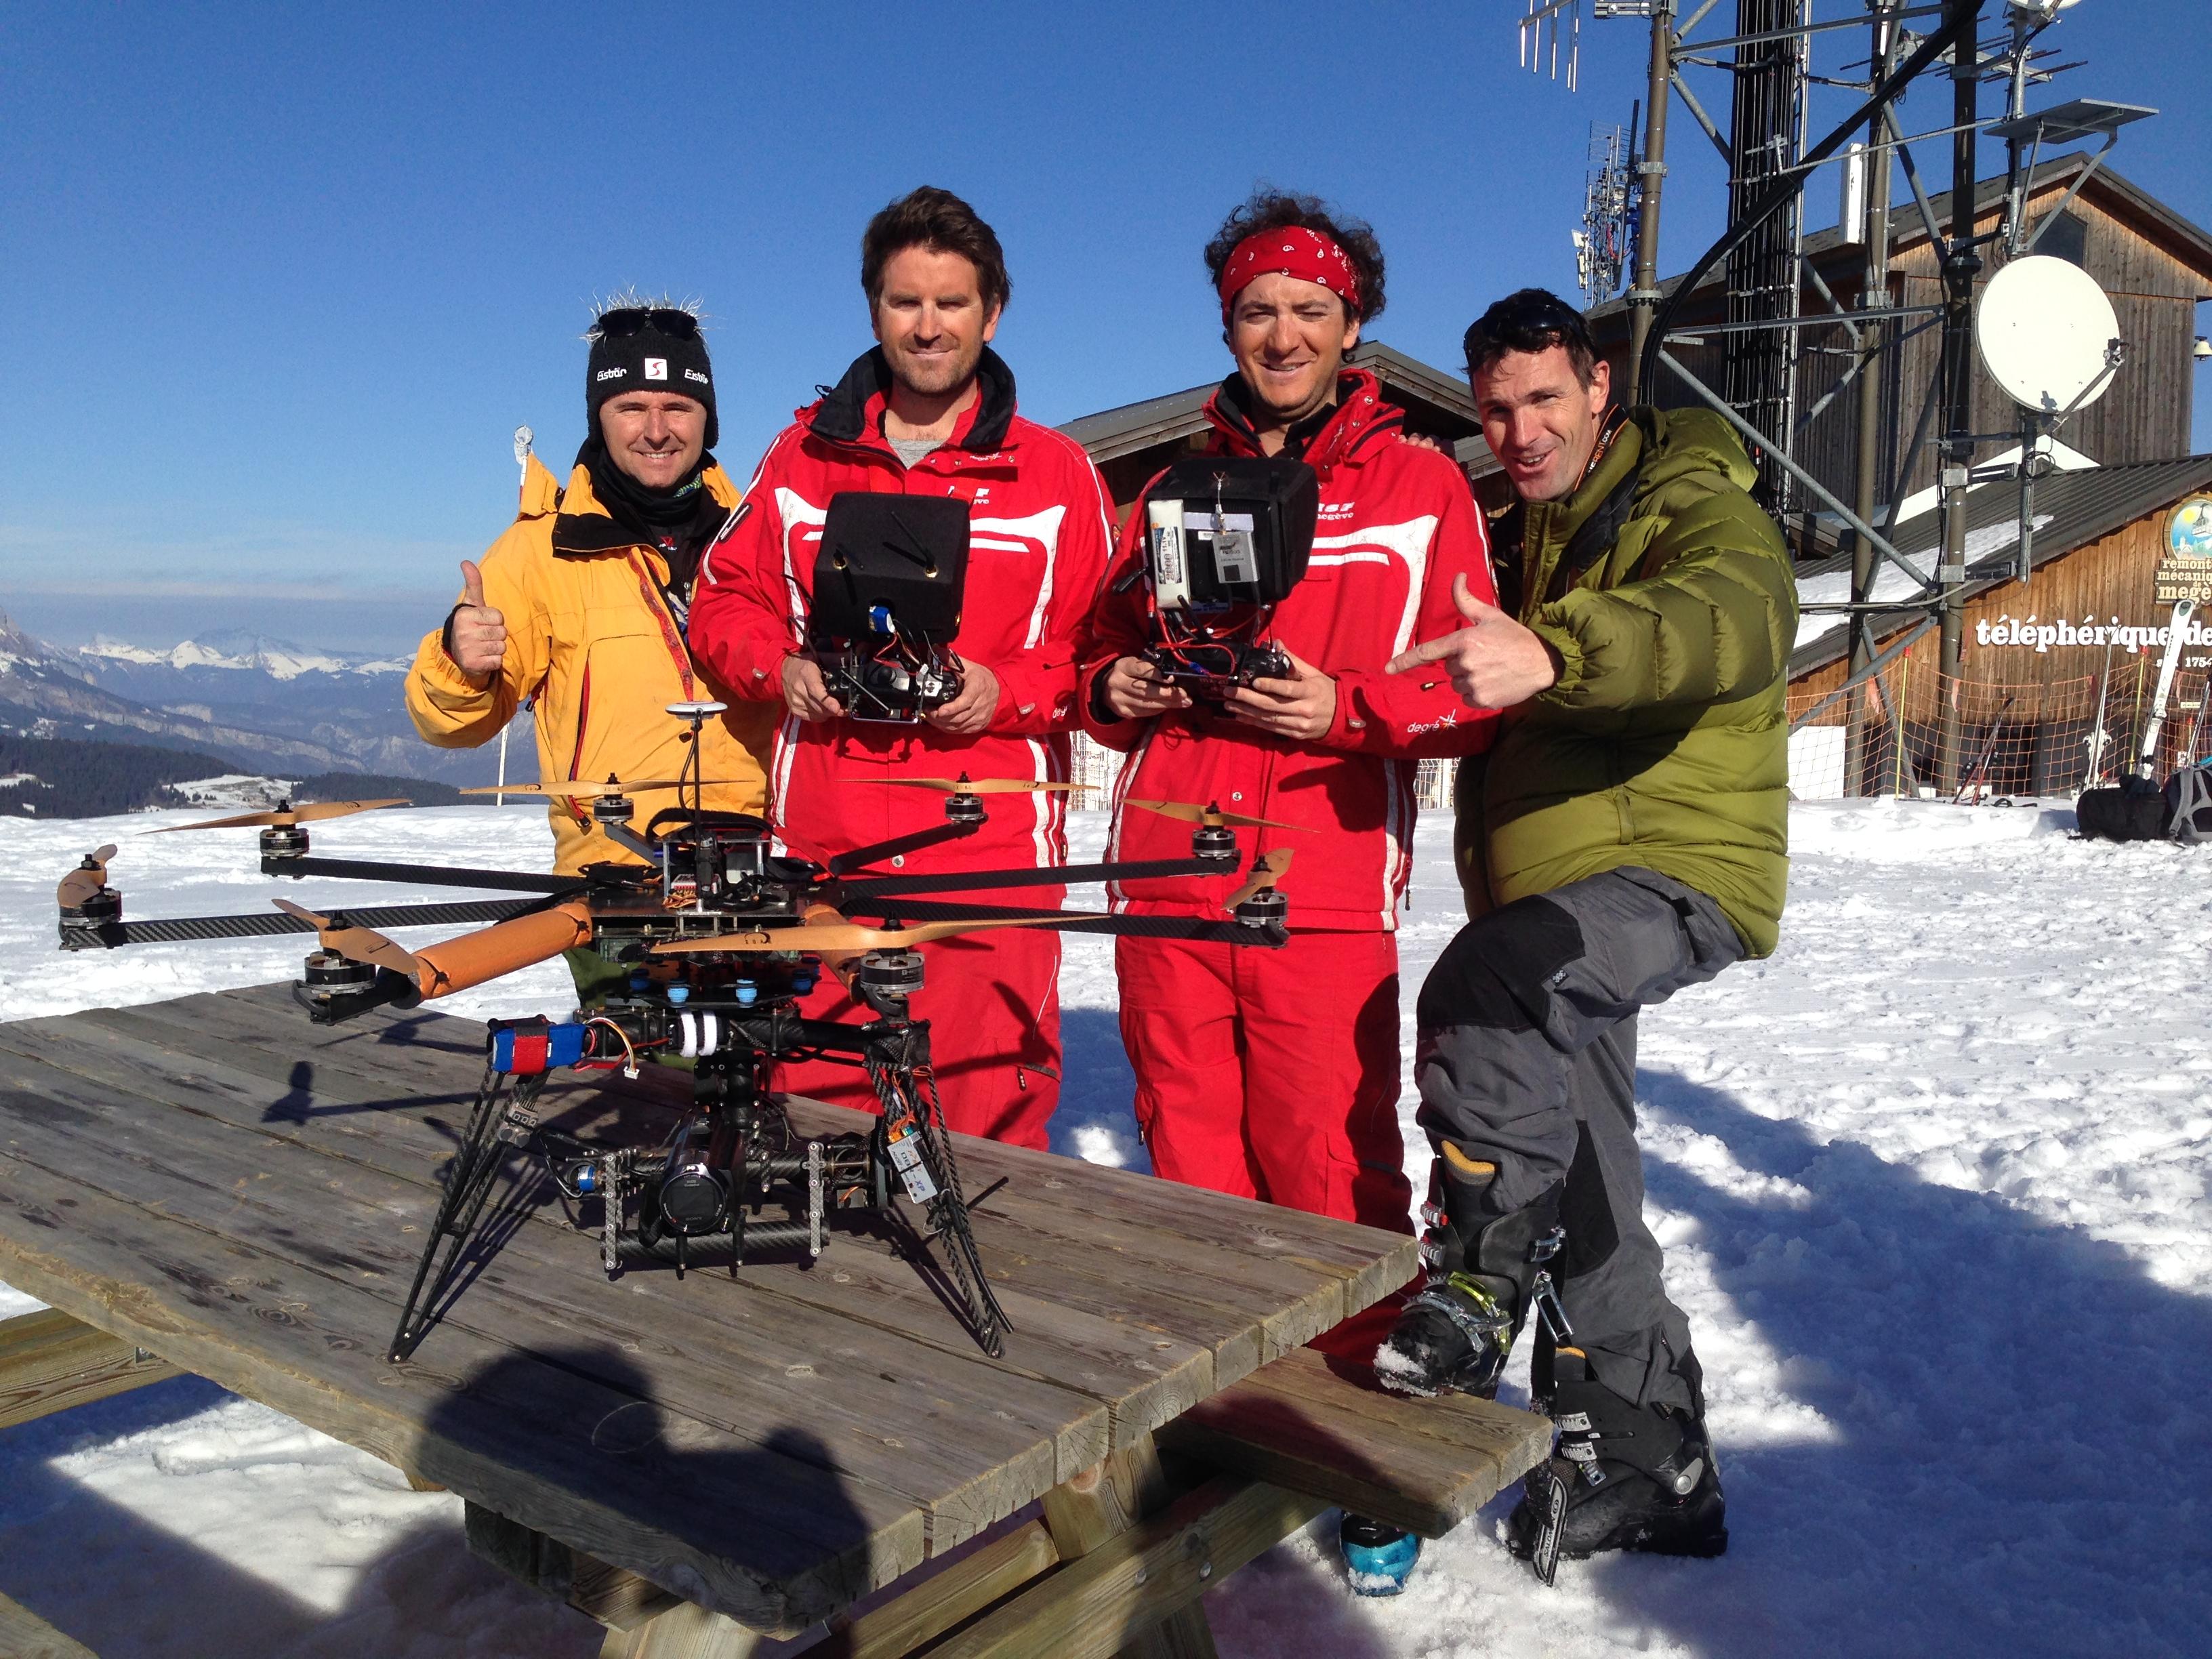 palmashow monos de ski chanson humour gregoire ludig david marsais